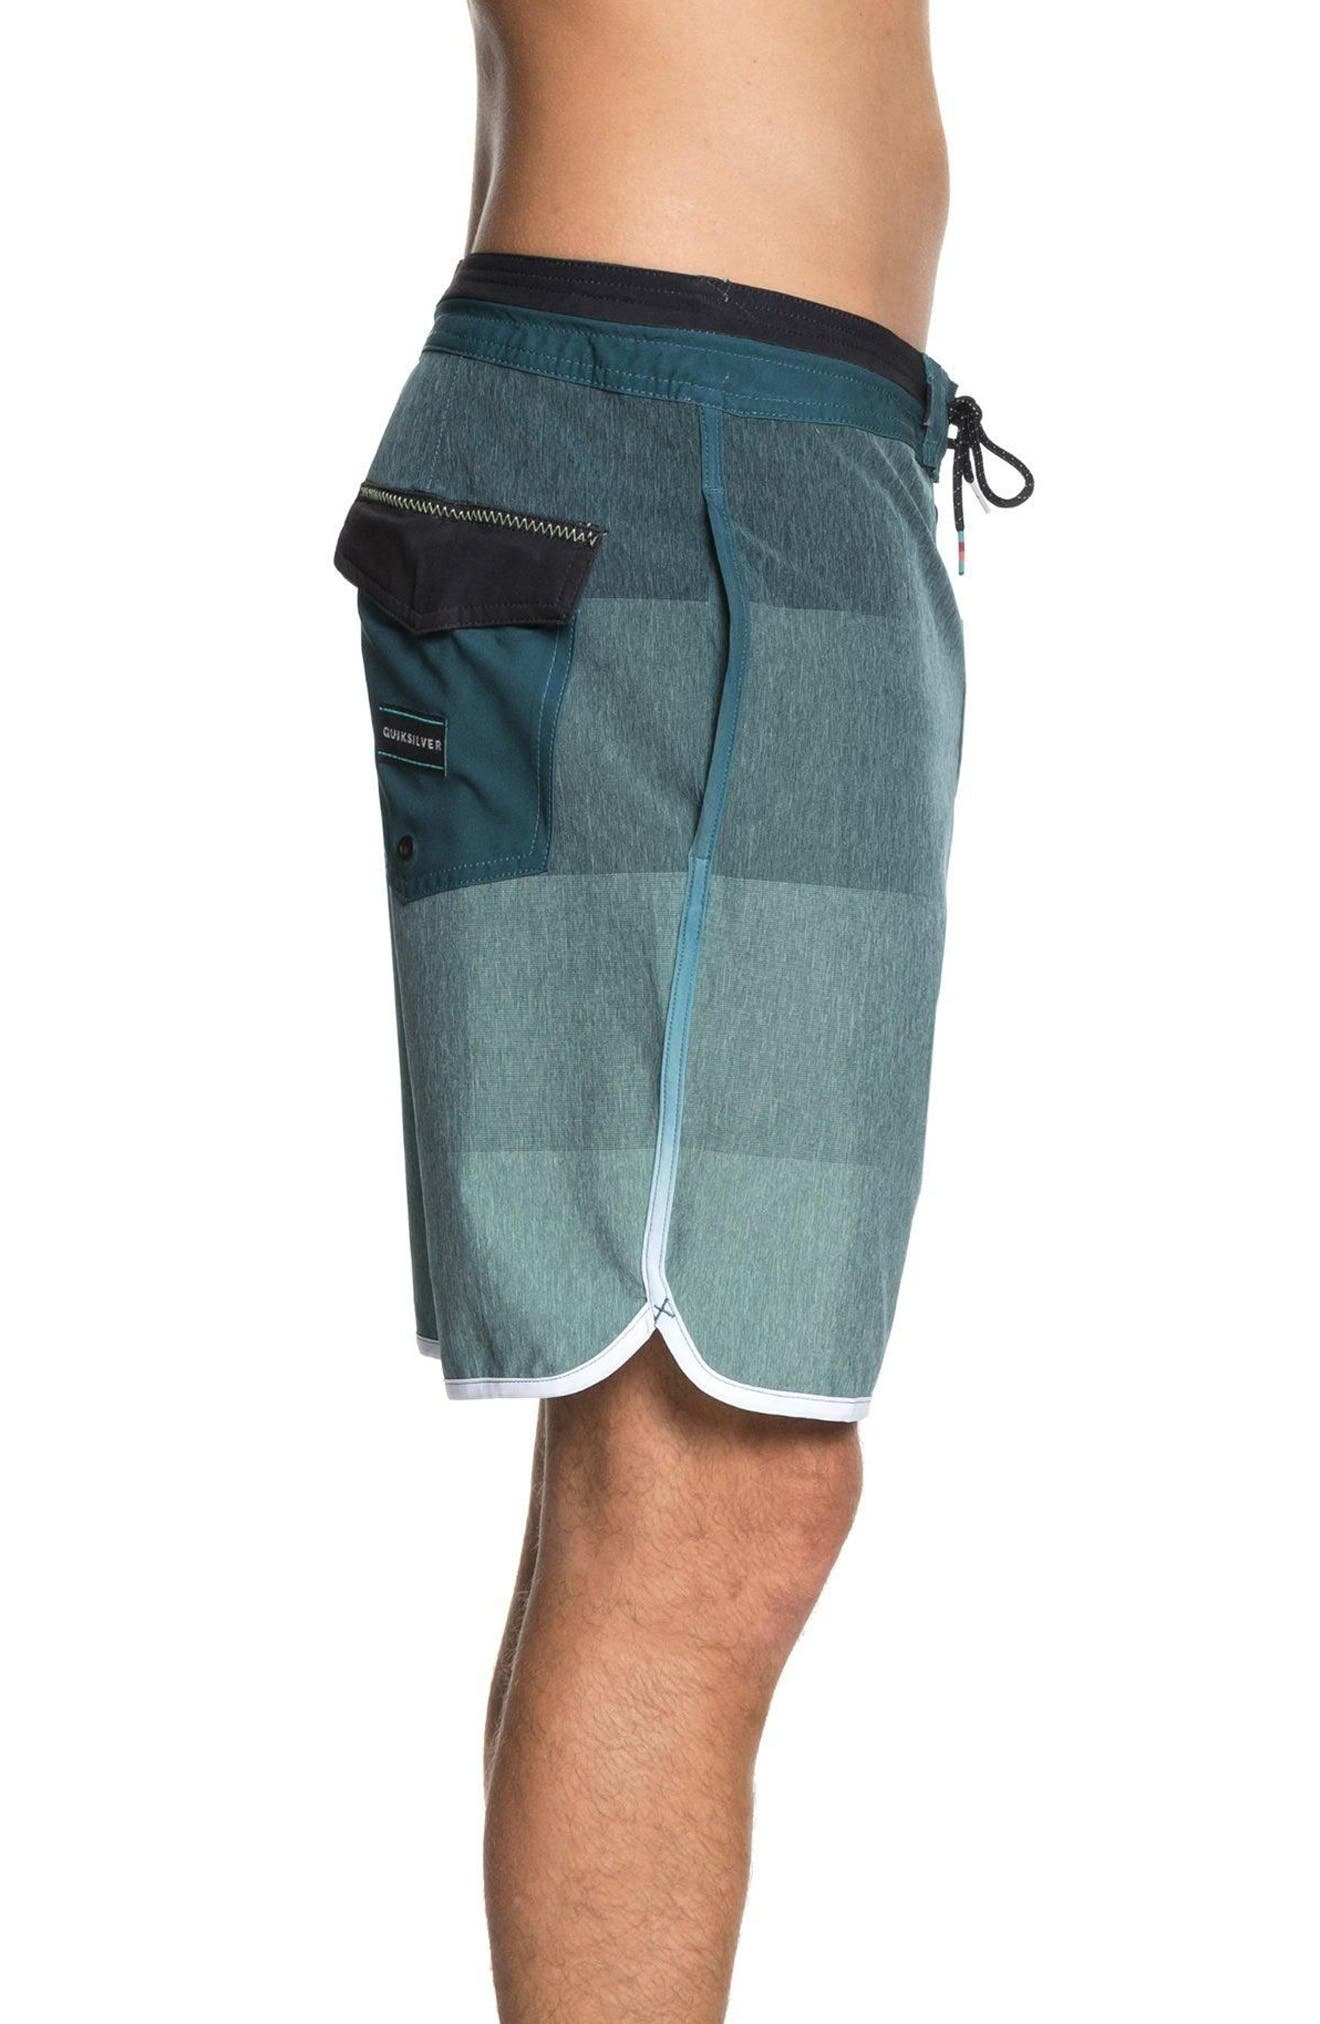 Vista Swim Shorts,                             Alternate thumbnail 3, color,                             Atlantic Deep